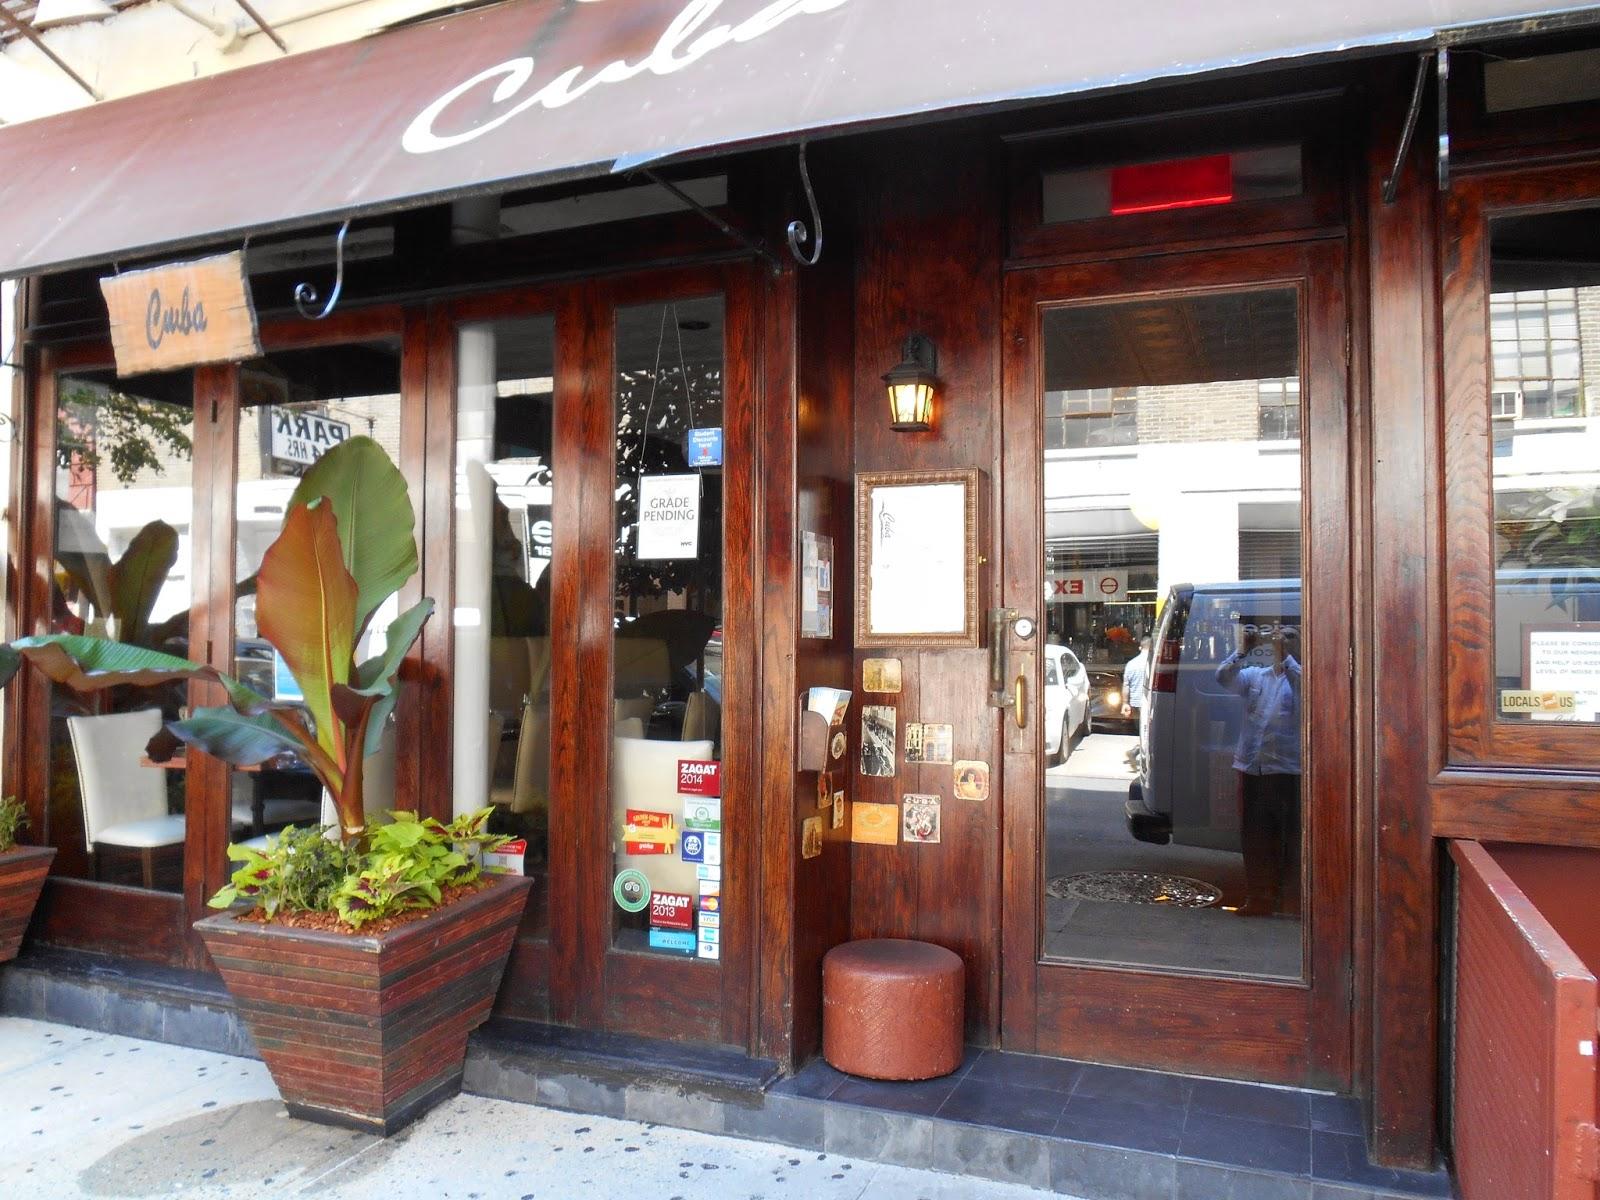 gourmet restaurants new york. cuba restaurant, new york city gourmet restaurants